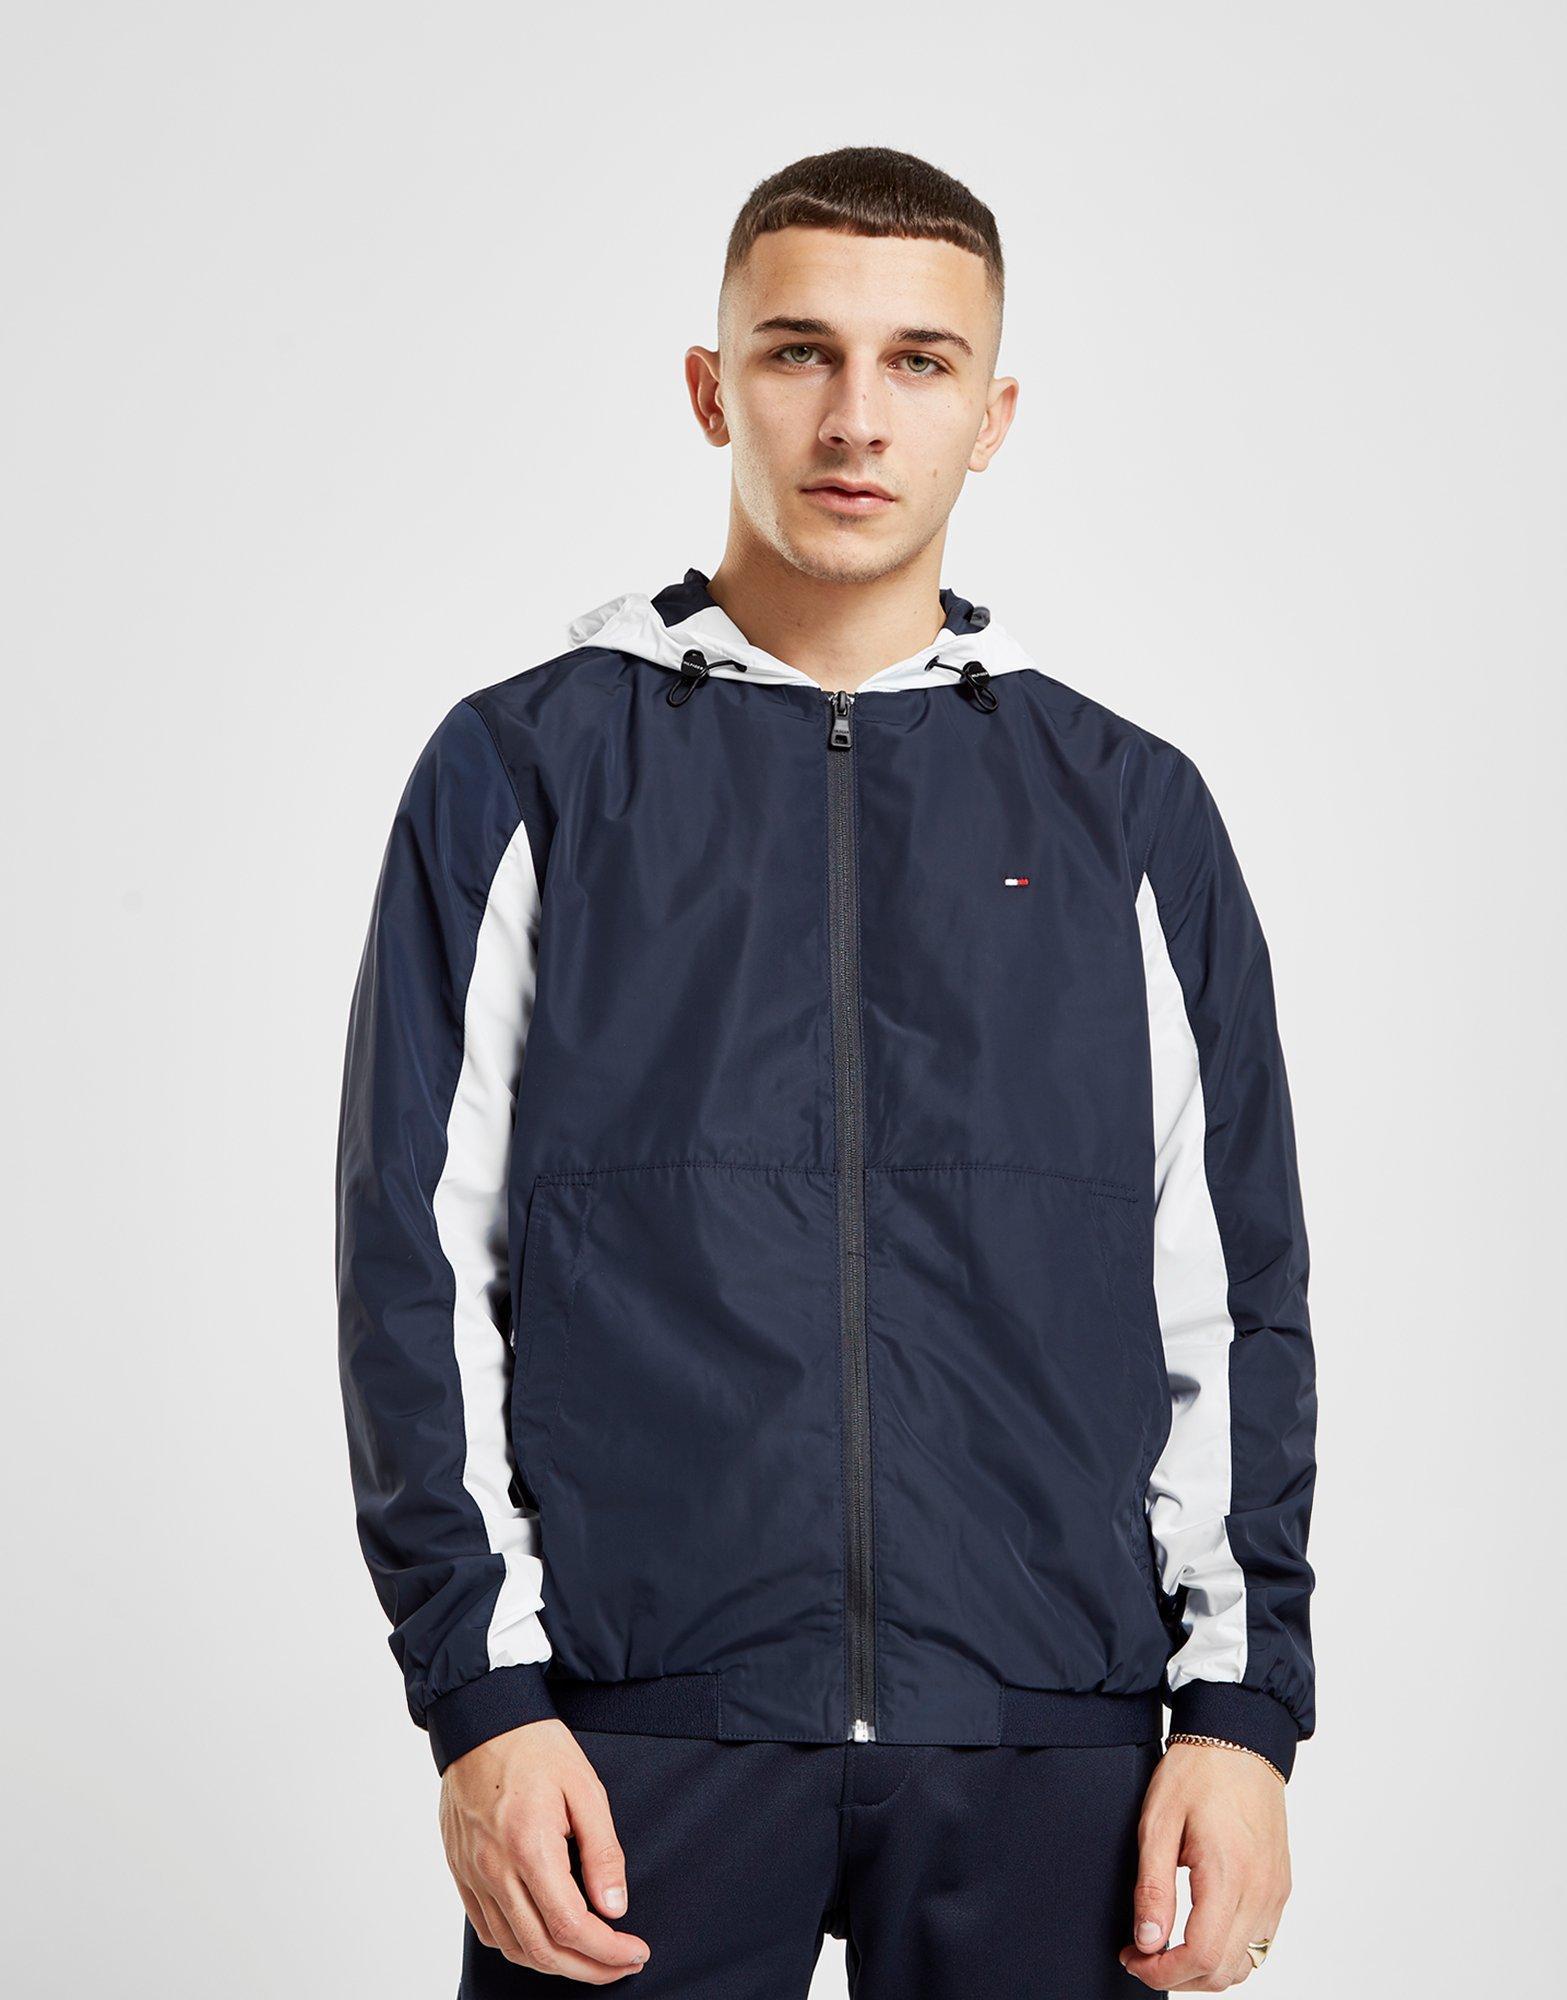 2ec4e4b21 Tommy Hilfiger Colour Block Zip Through Jacket in Blue for Men - Lyst